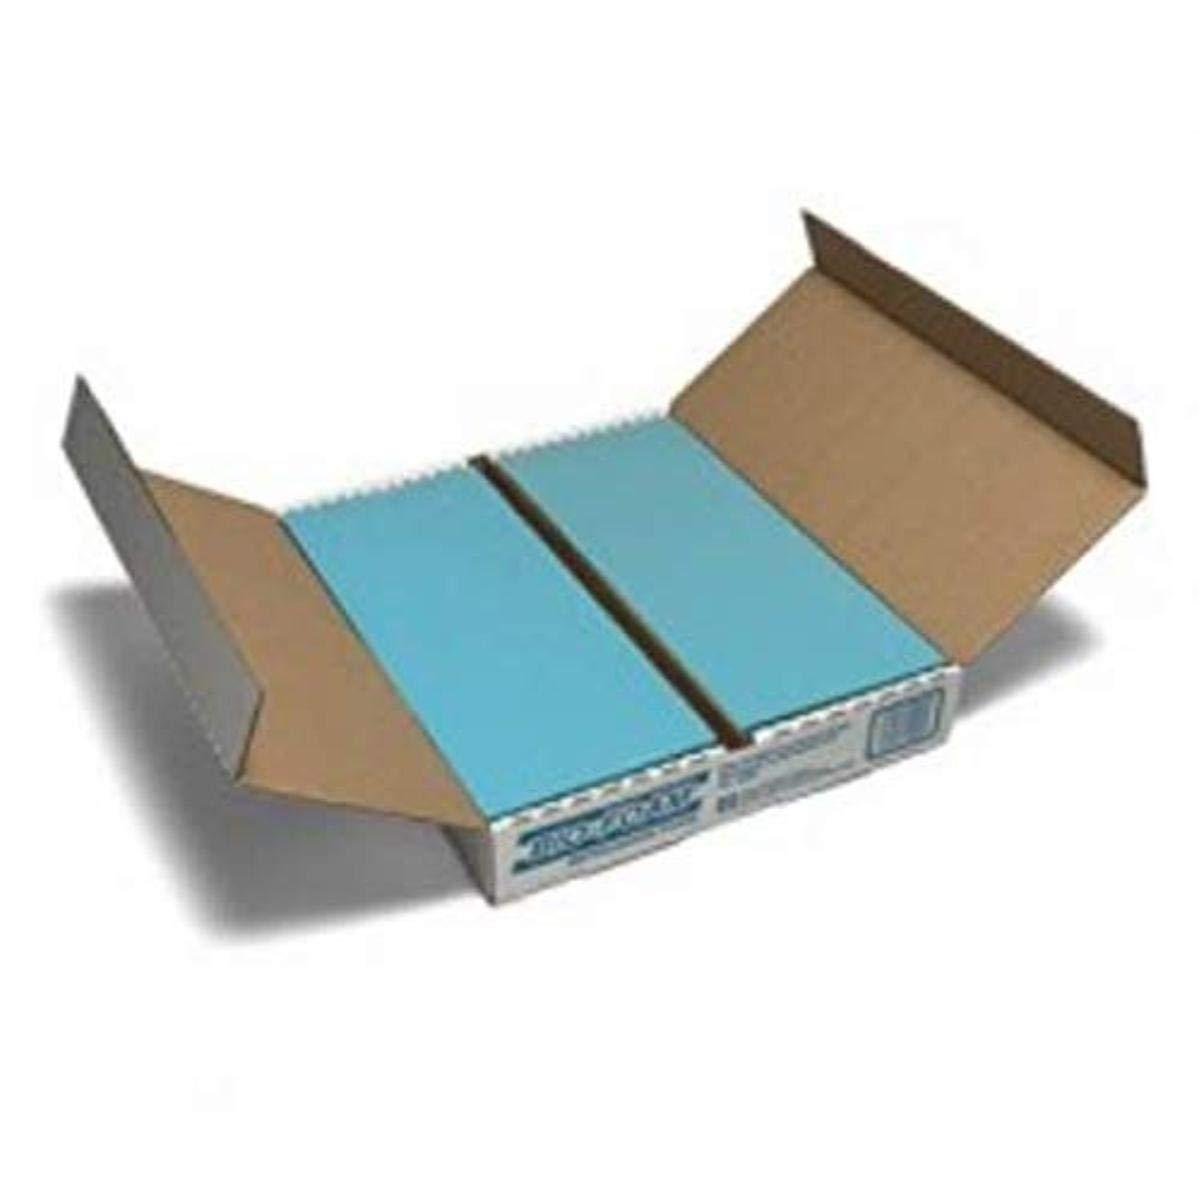 Colorado Springs Mall Bio-Foam-31340 Impression Foam Includes Mailing 6 of Box Case Max 50% OFF